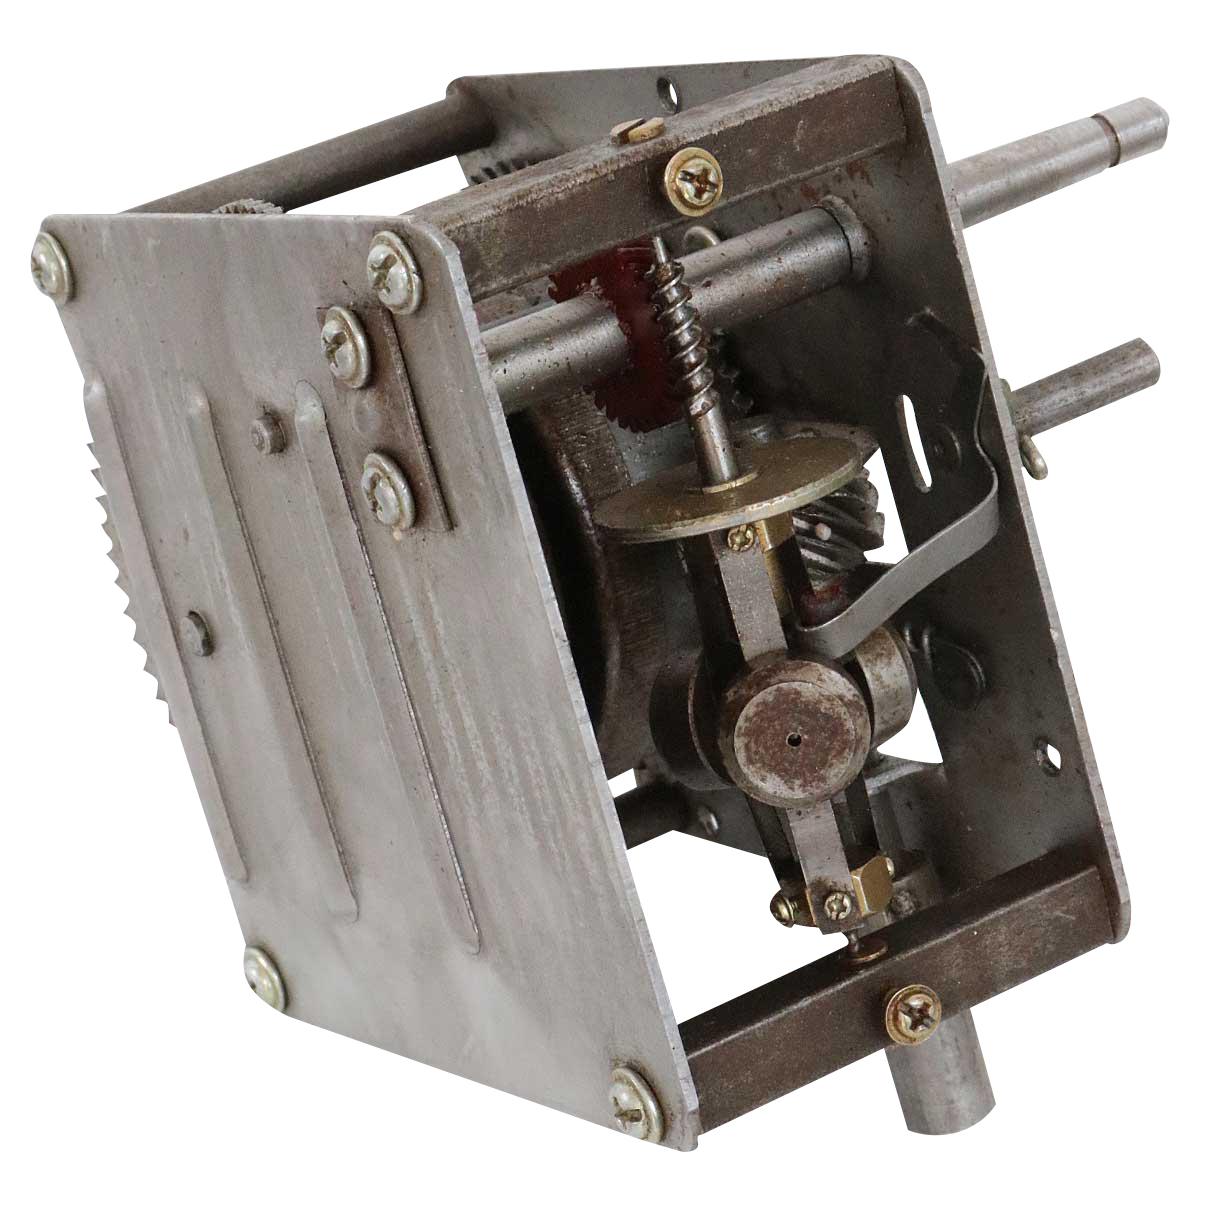 Grammophon motor ersatzteil antik stil federlaufwerk for Ebay motors warehouse in billings montana